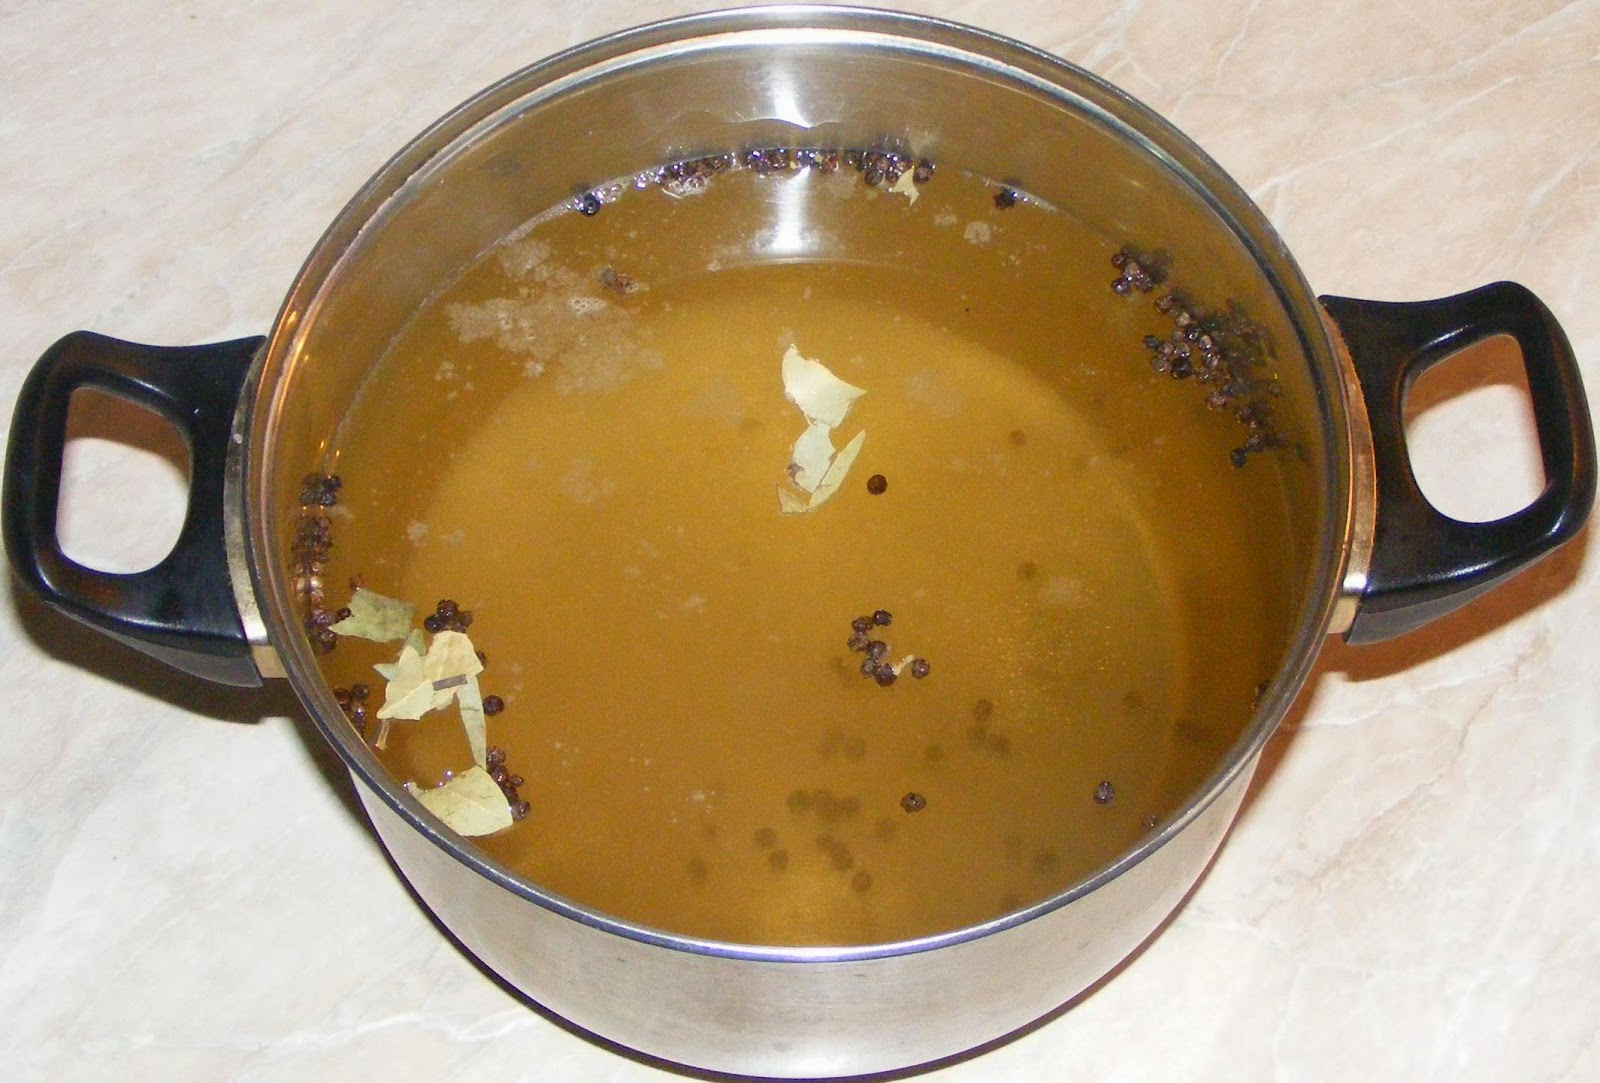 saramura din otet pentru gogosari, saramura, saramura pentru gogosari in otet, retete saramura, reteta saramura, retete si preparate culinare saramura din otet,